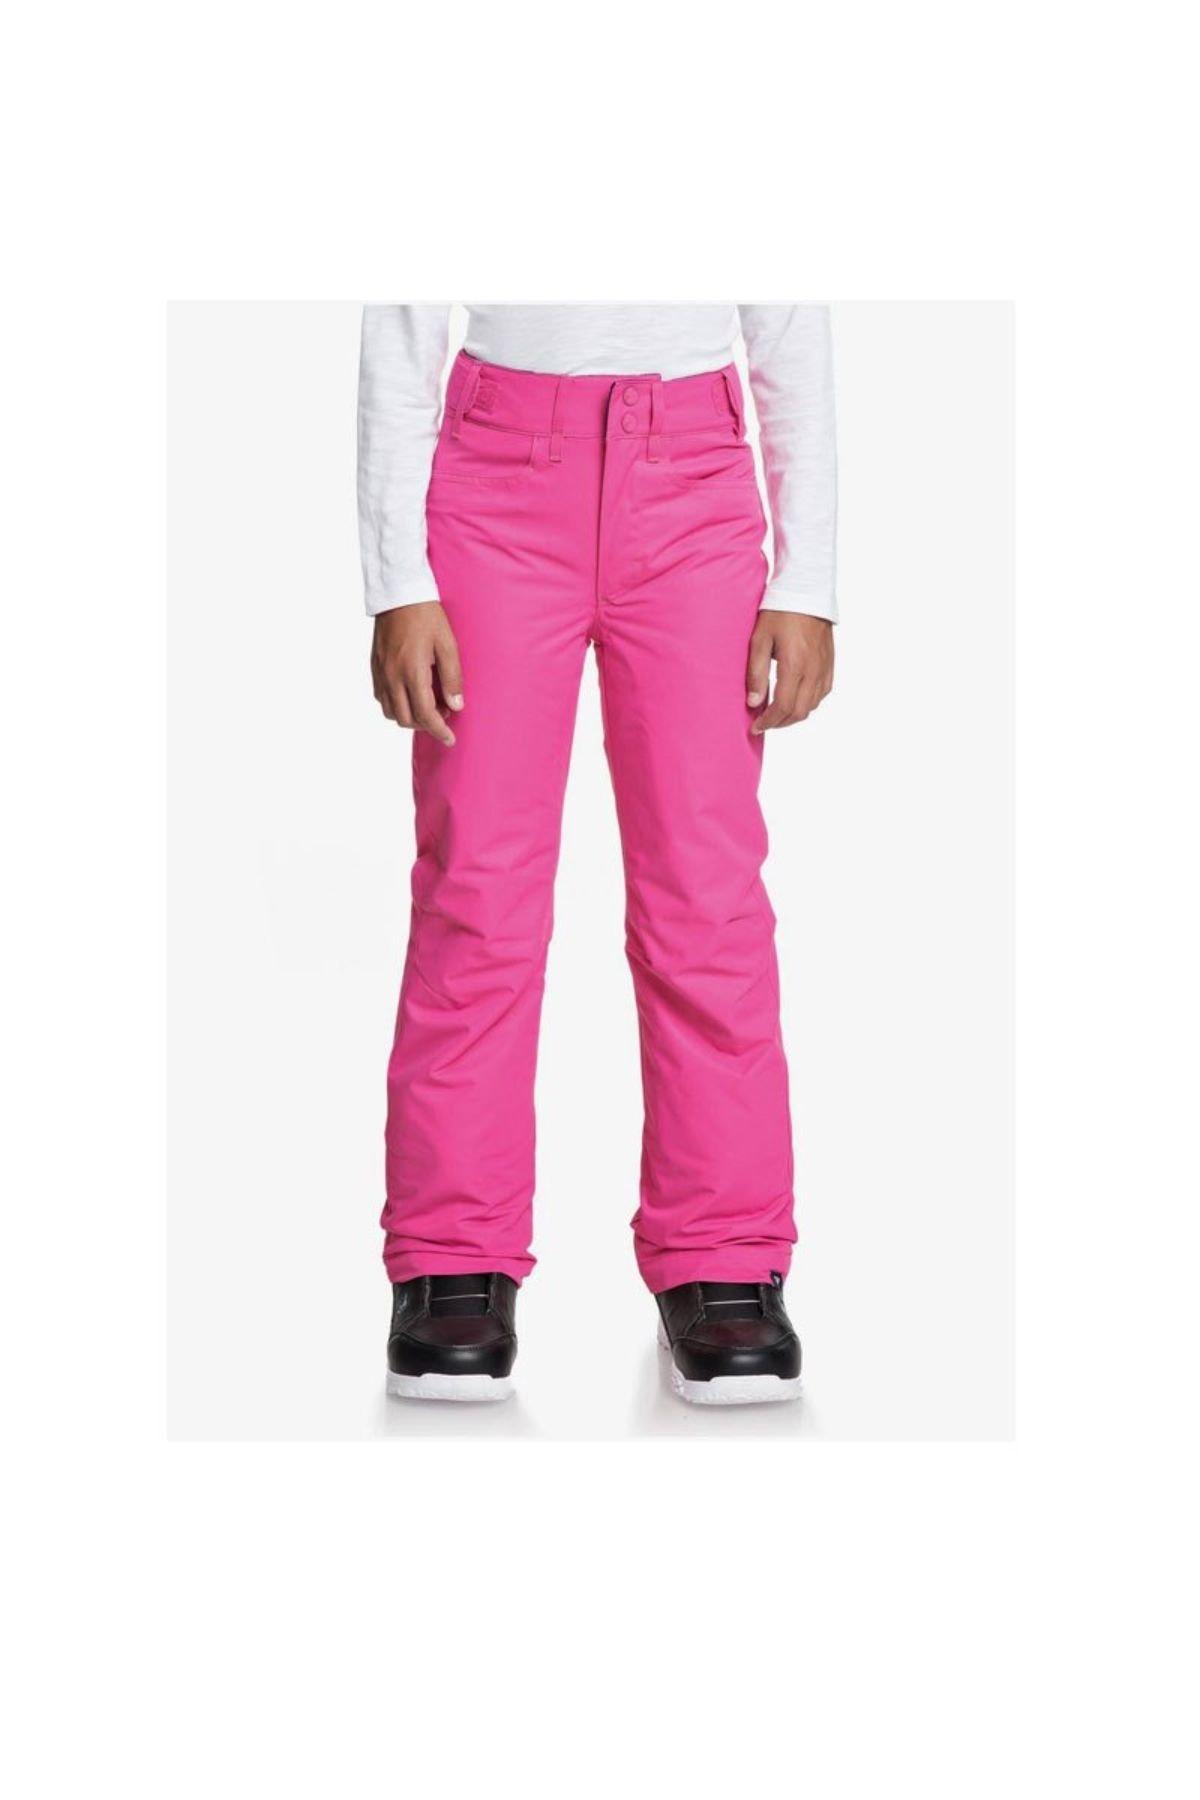 Roxy Backyard Kız Çocuk Kayak Pantolonu ERGTP03021NML0 1